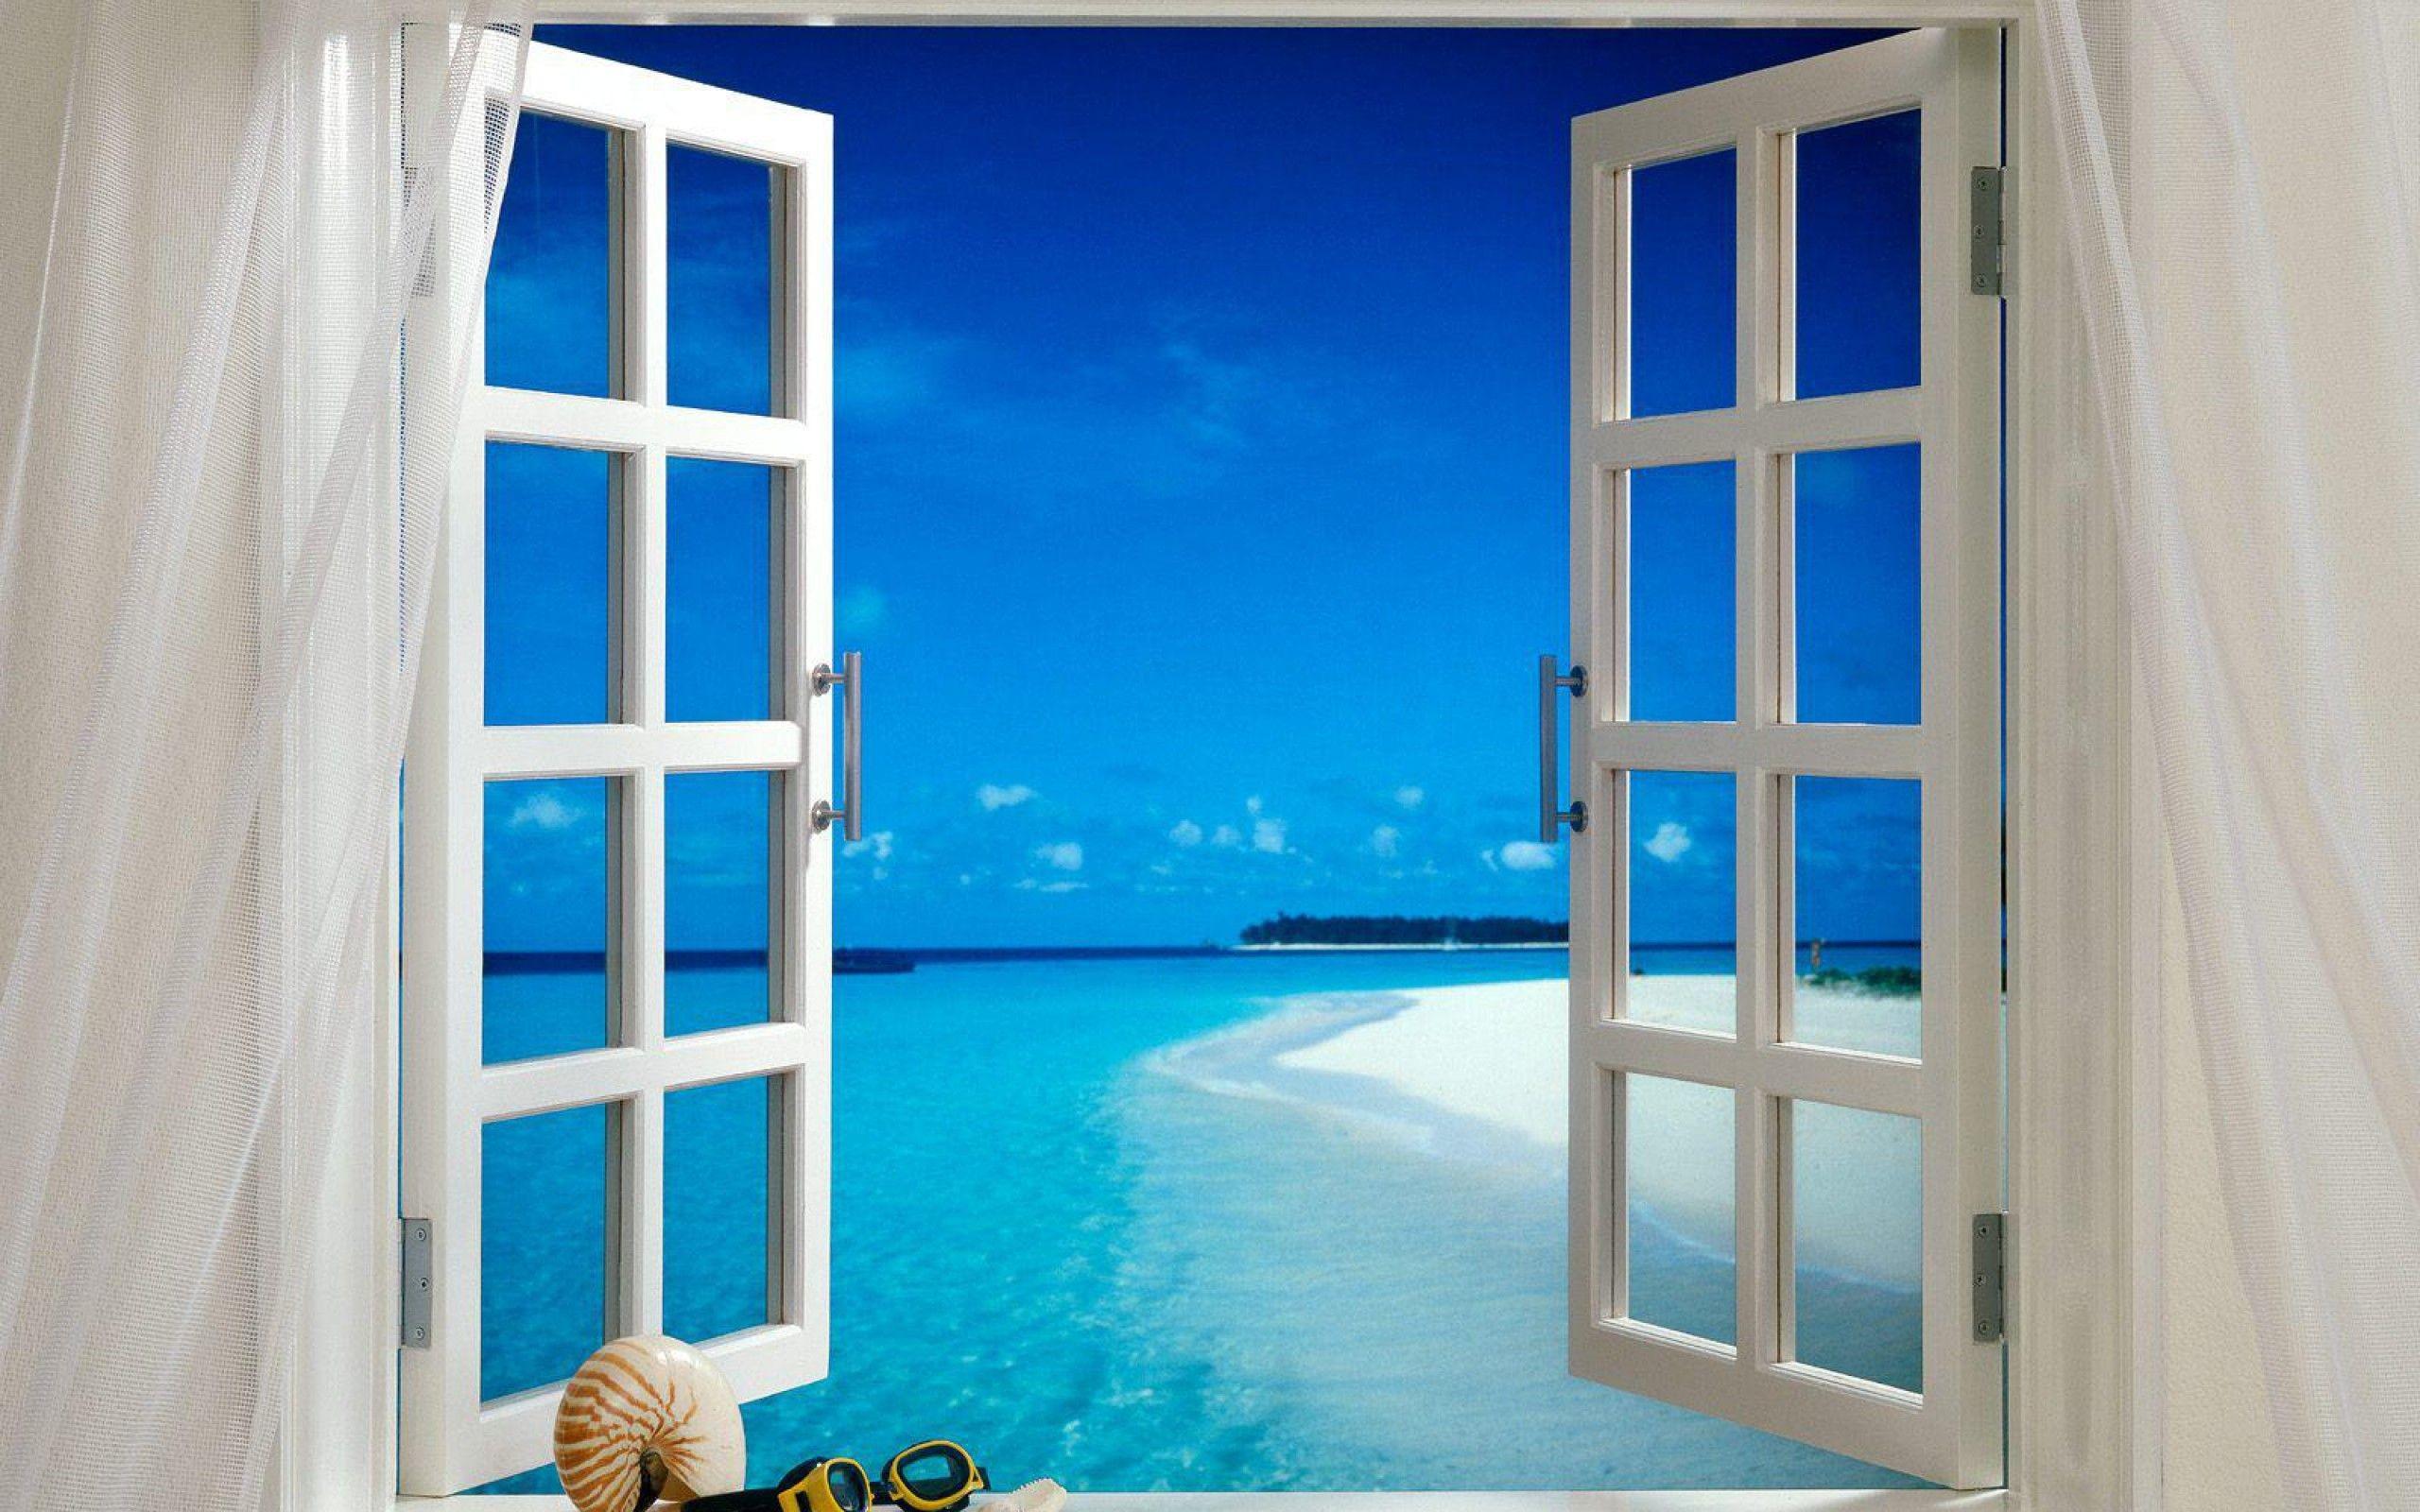 Res: 2560x1600, Window Wallpapers 17 - 2560 X 1600